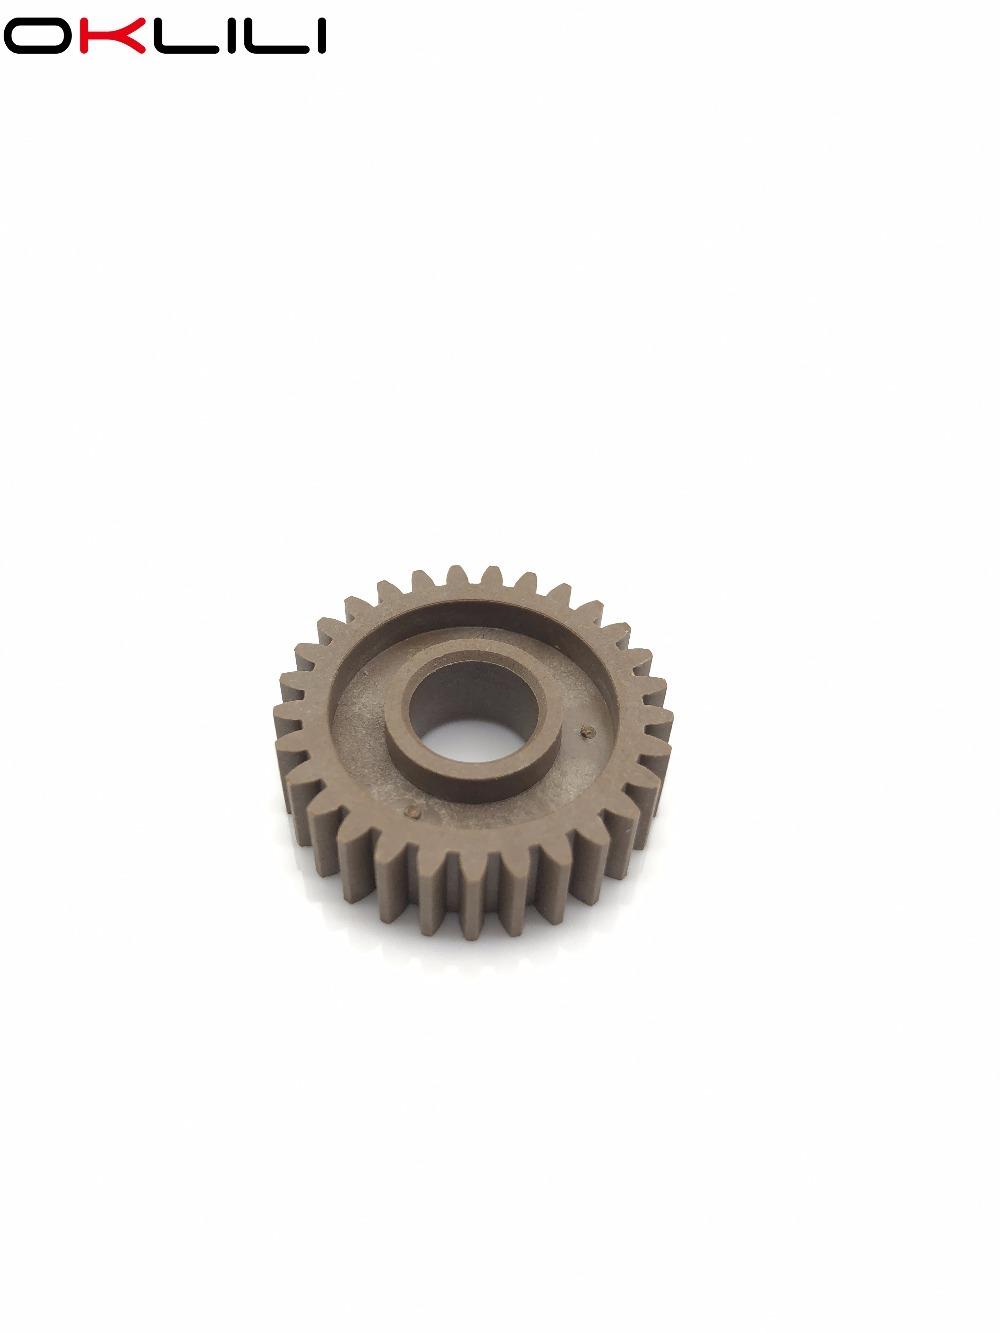 50PCX 302F925080 GEAR IDLE A Z29 for Kyocera FS1024 FS1028 FS1030 FS1035 FS1100 FS1110 FS1124 FS1128 FS1130 FS1135 FS1300 FS1320